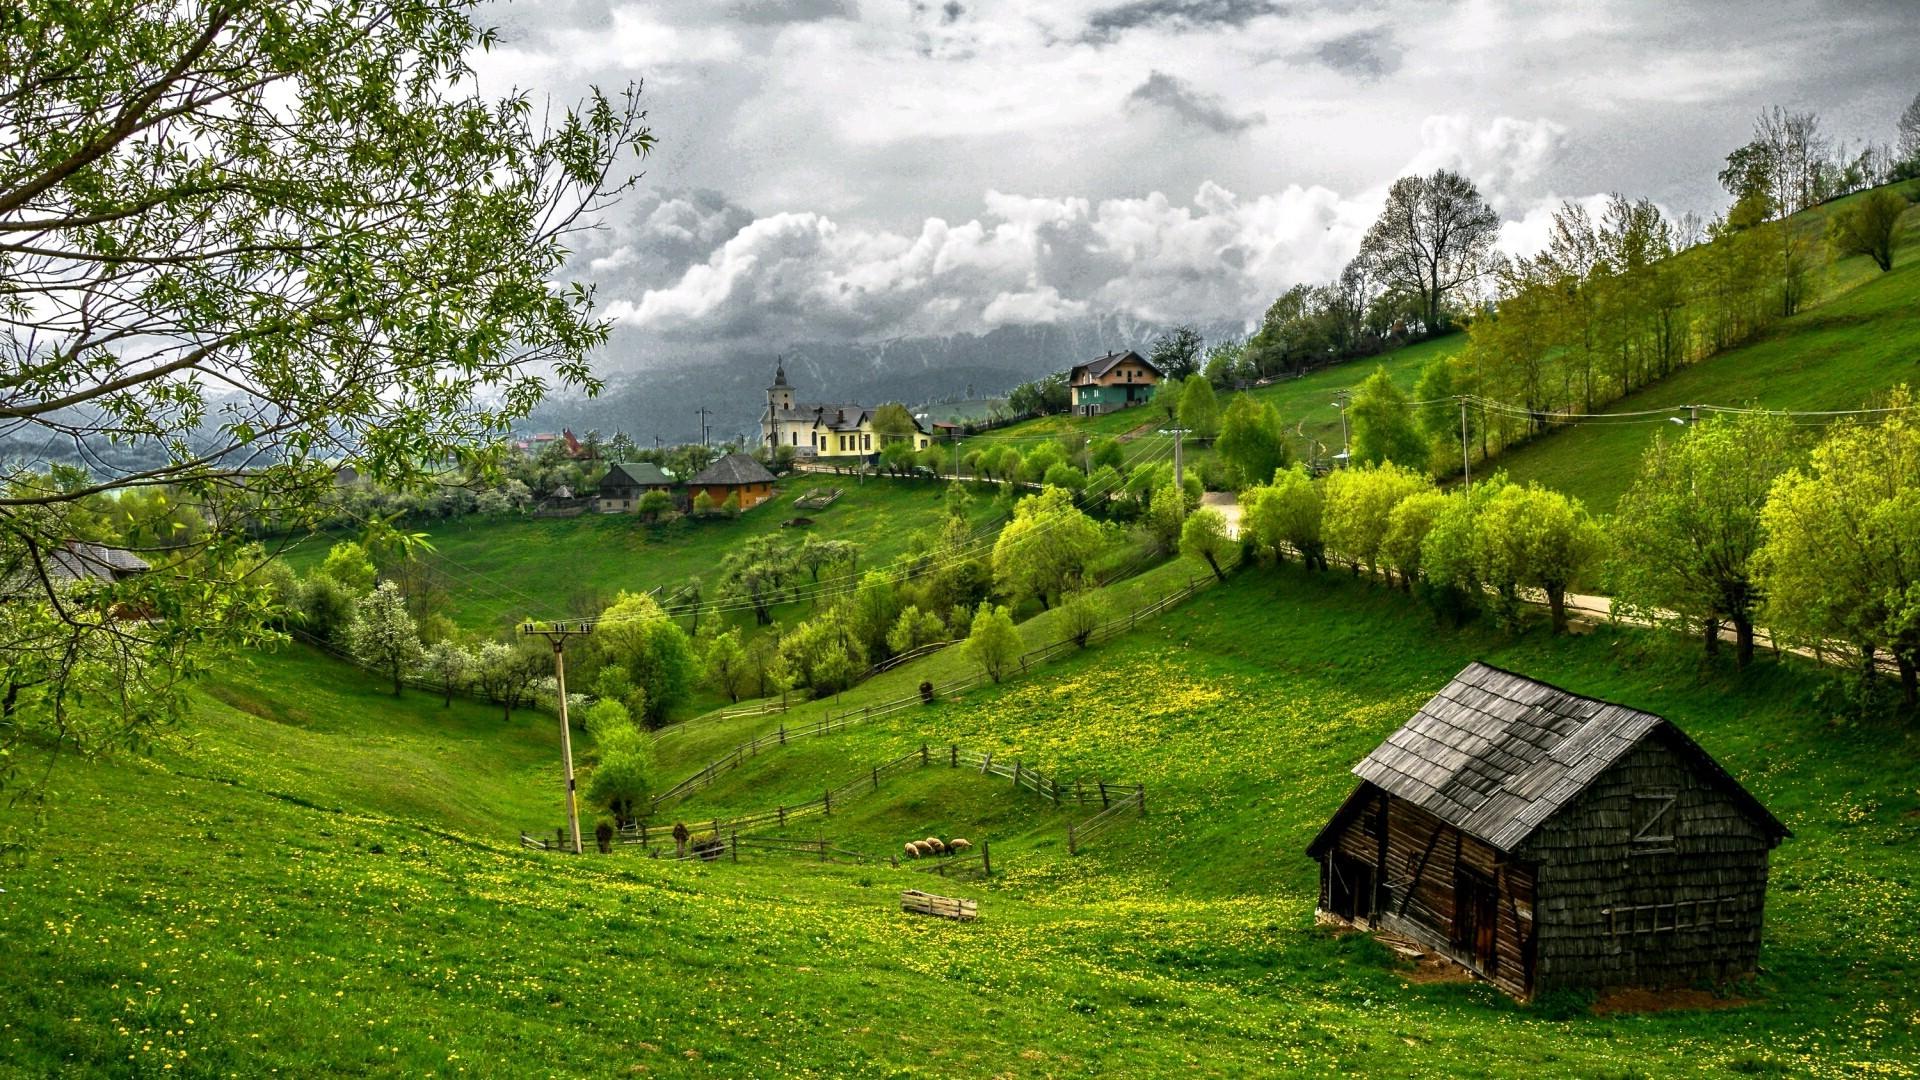 Wallpaper : Landscape, Hill, Nature, Field, Green, Village